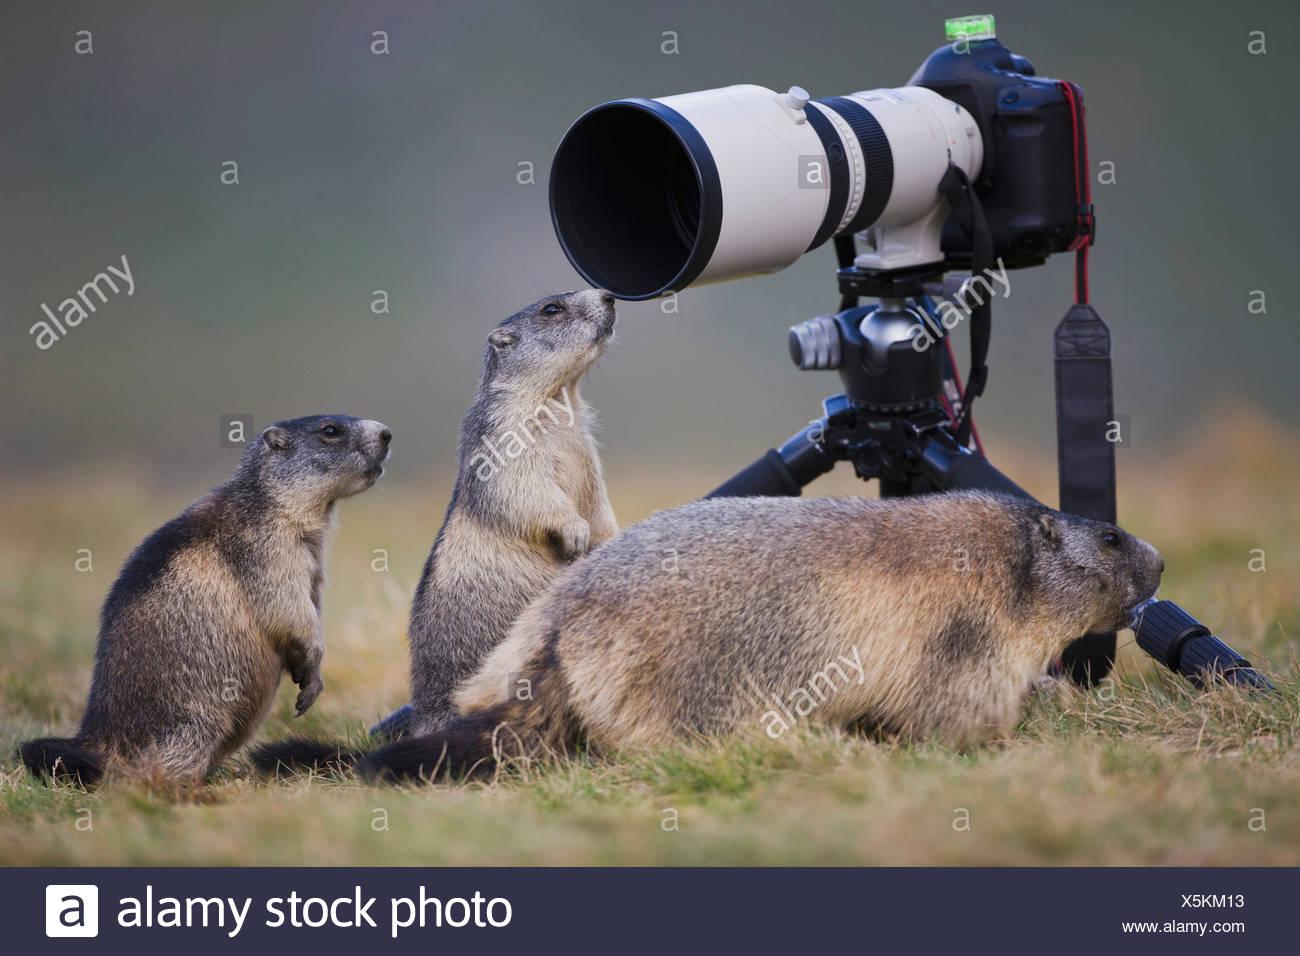 Austria, Alpine Marmots (Marmota marmota) next to camera - Stock Image